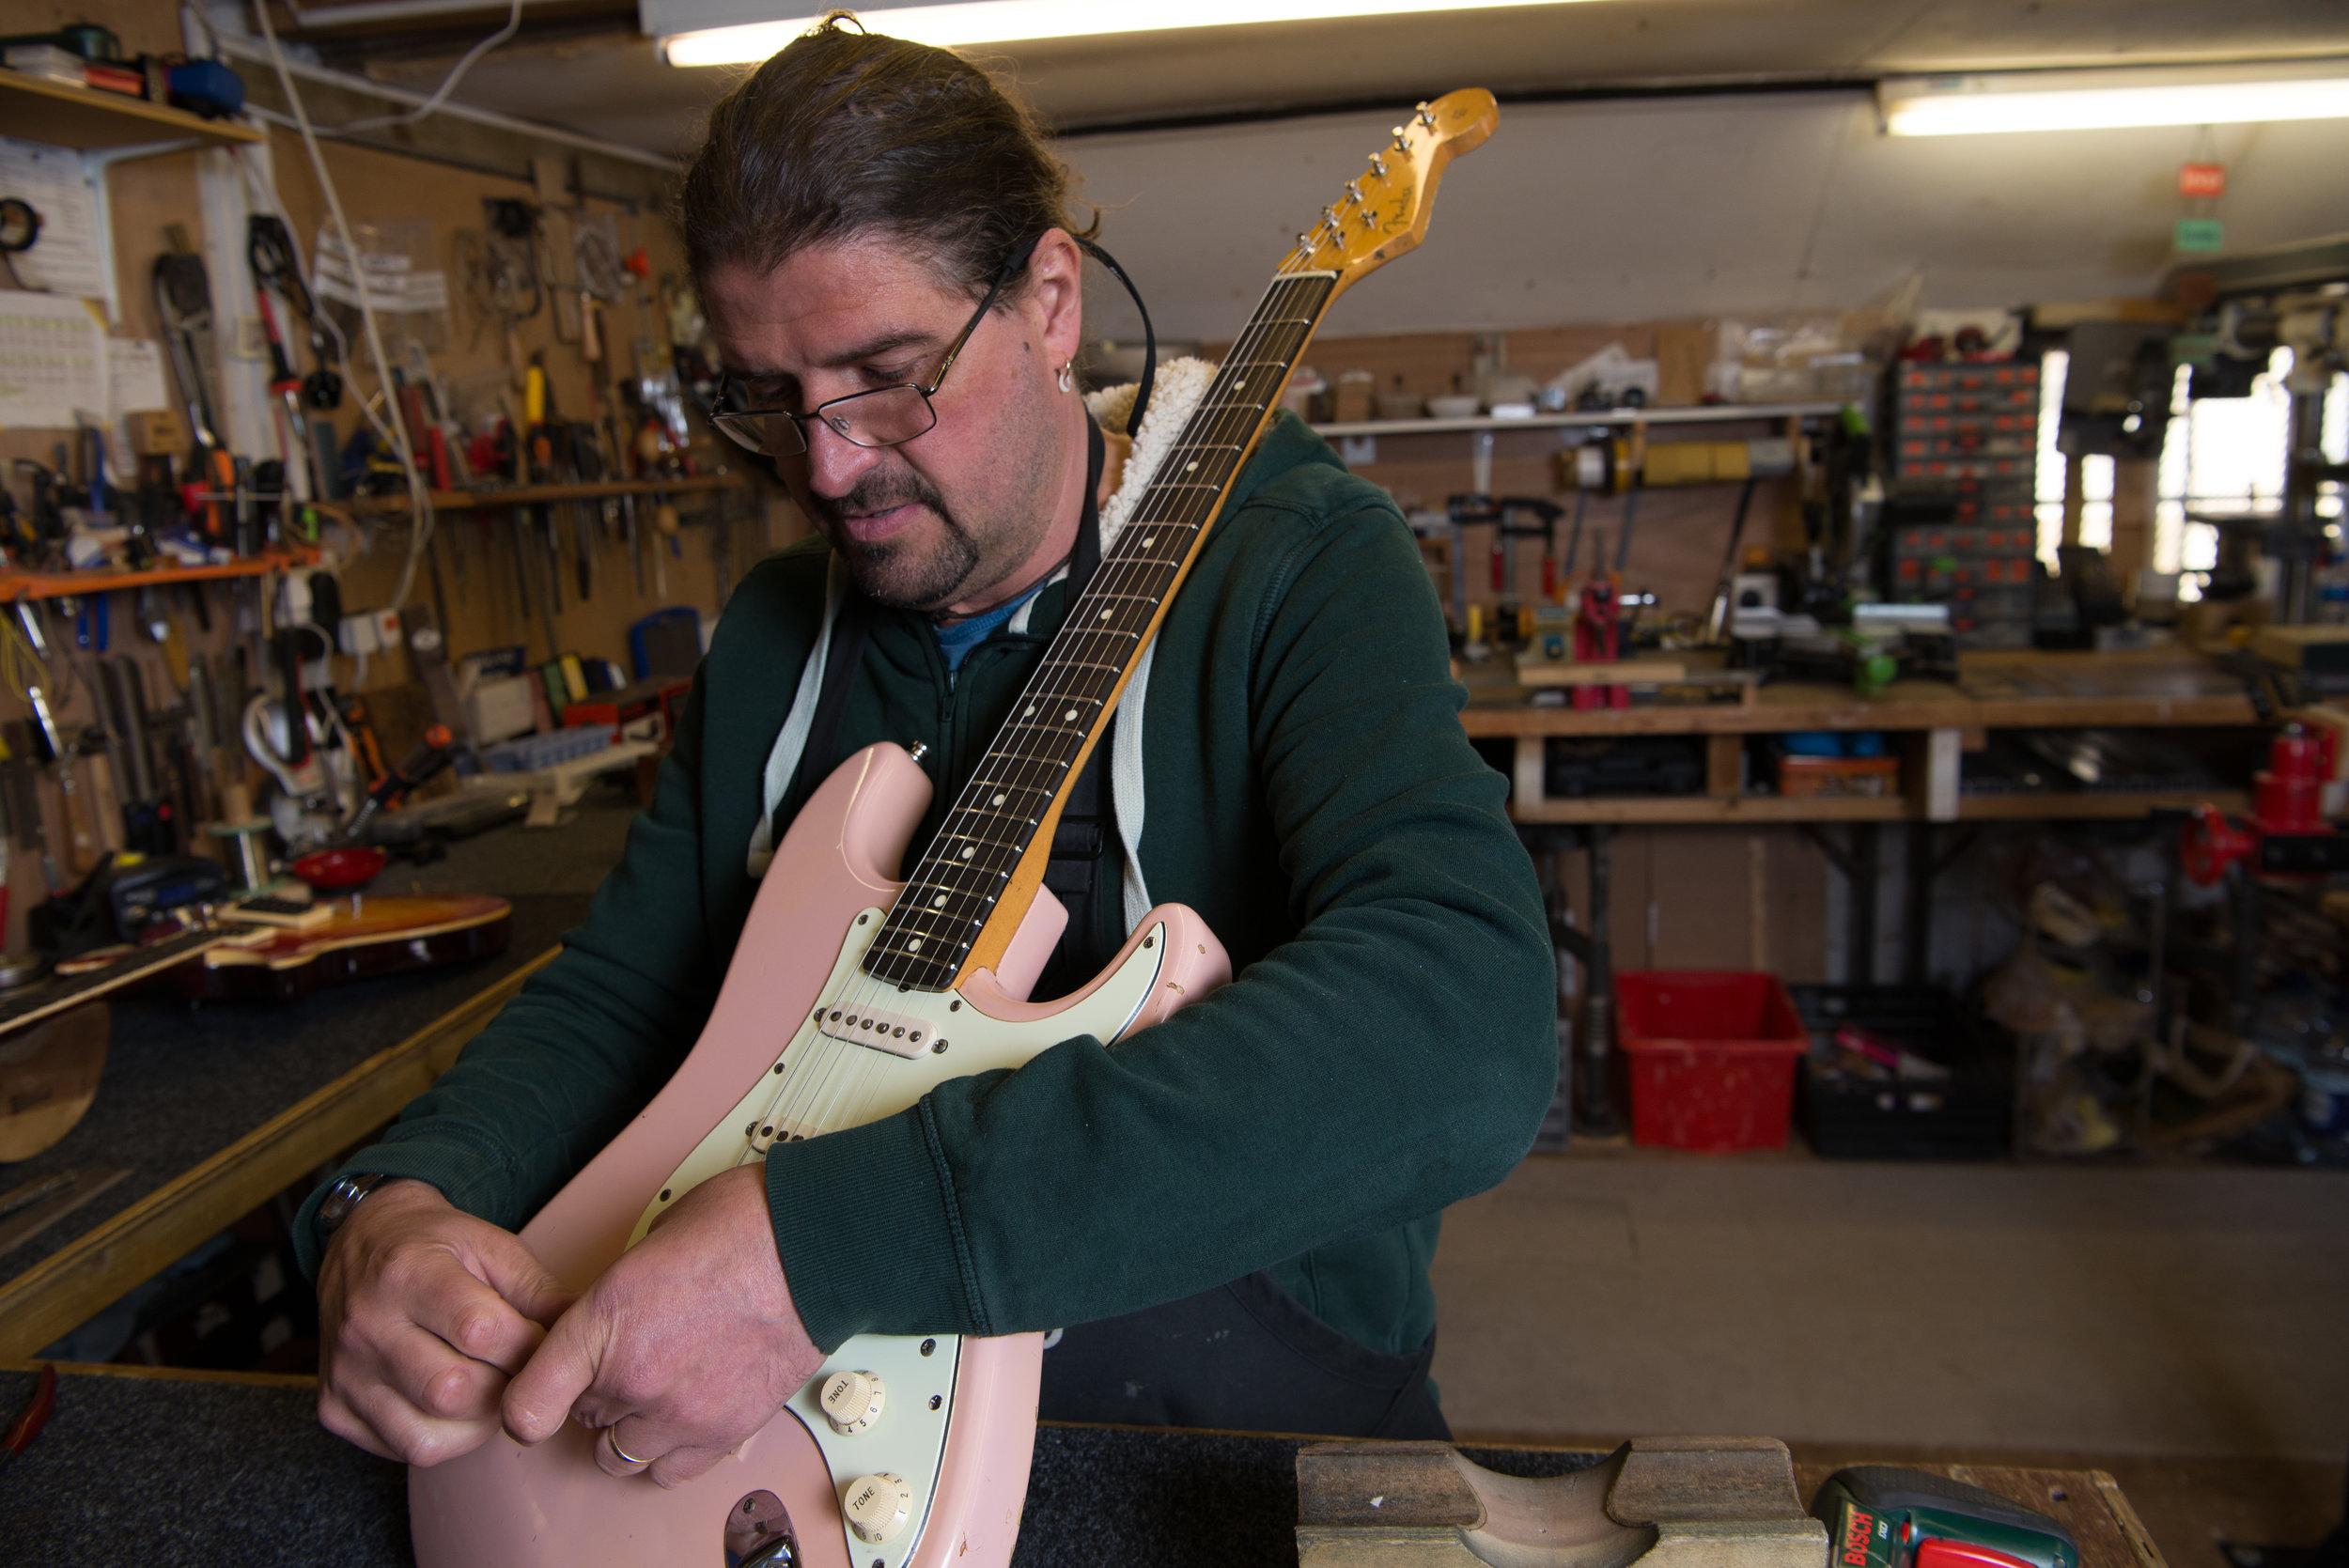 Julyan restringing the guitar. April 2018, Penzance, UK.